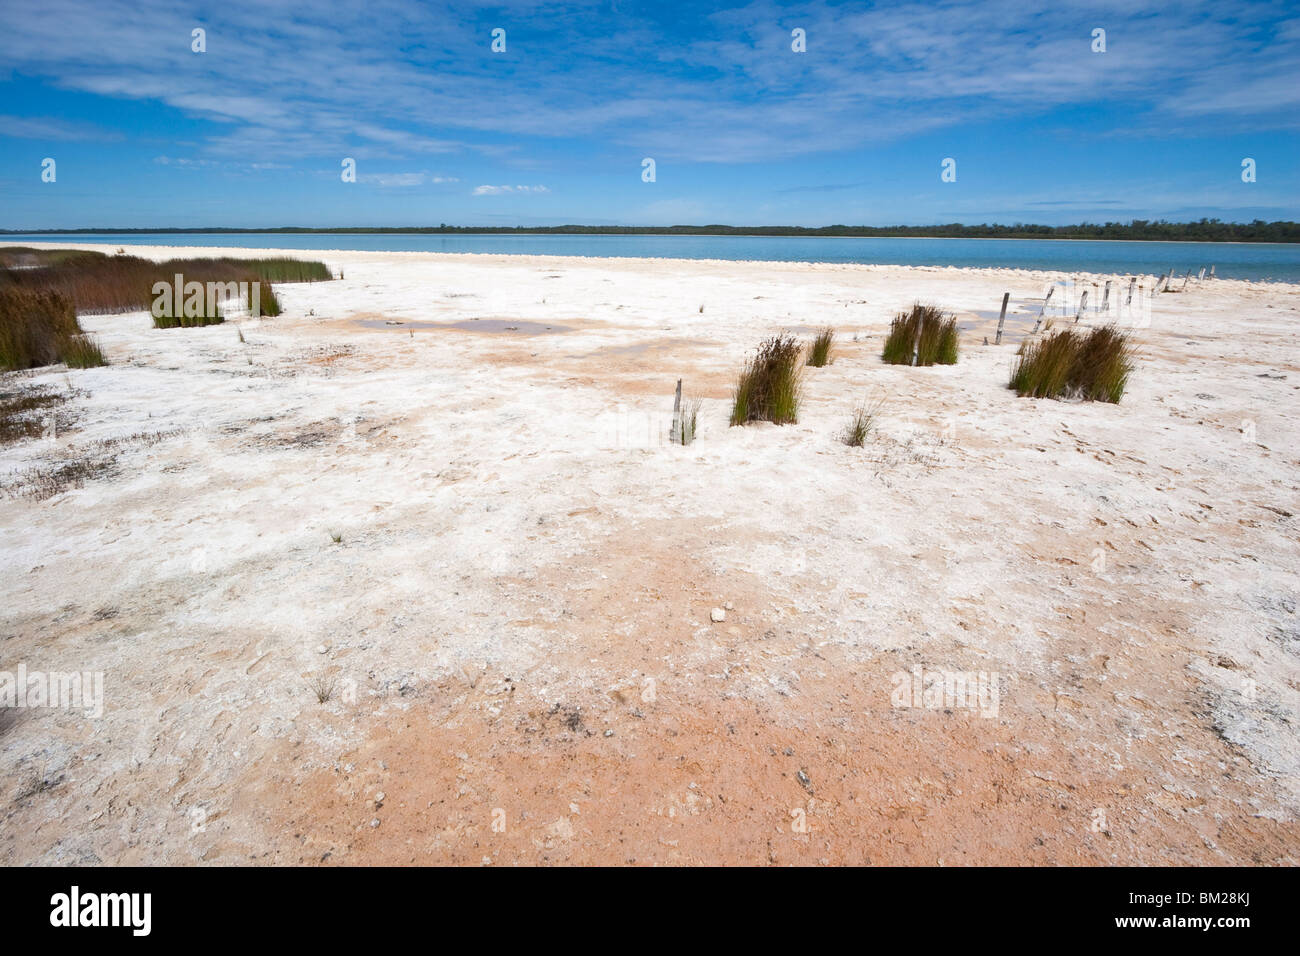 Salt and algal deposits at Lake Clifton, Yalgorup National Park, Mandurah, Western Australia - Stock Image